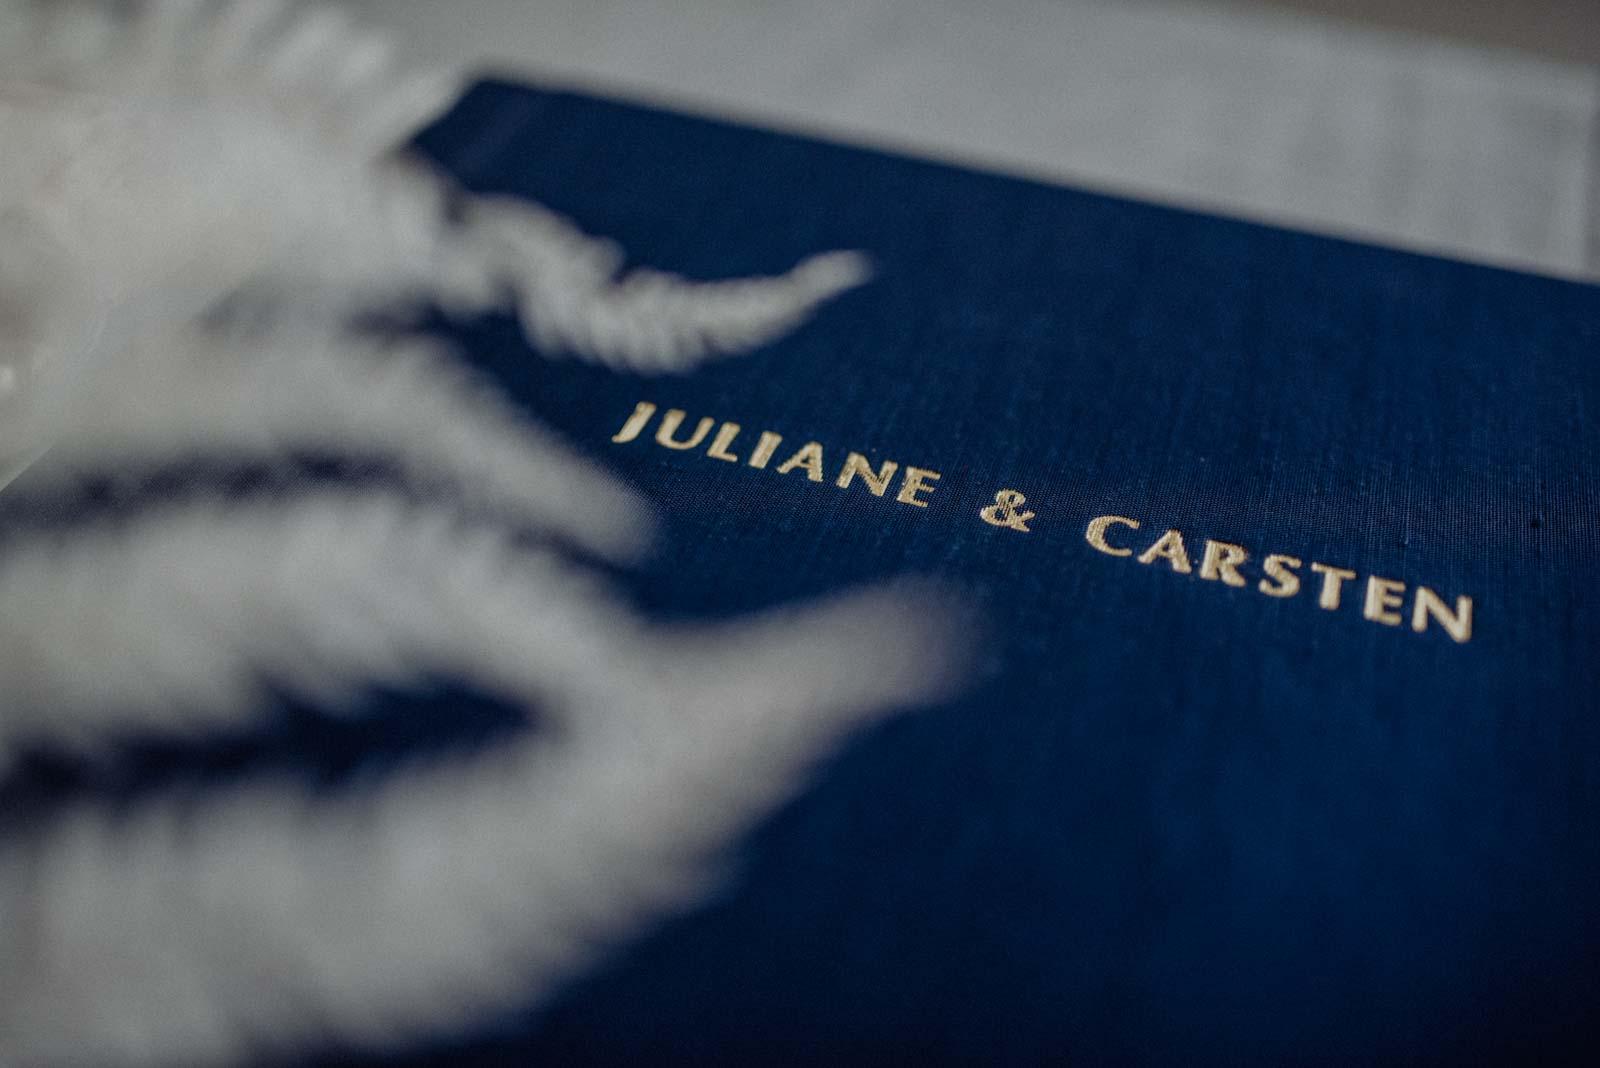 044-Fotoalbum-Fotobuch-Premium-Fotograf-Witten-Luxus